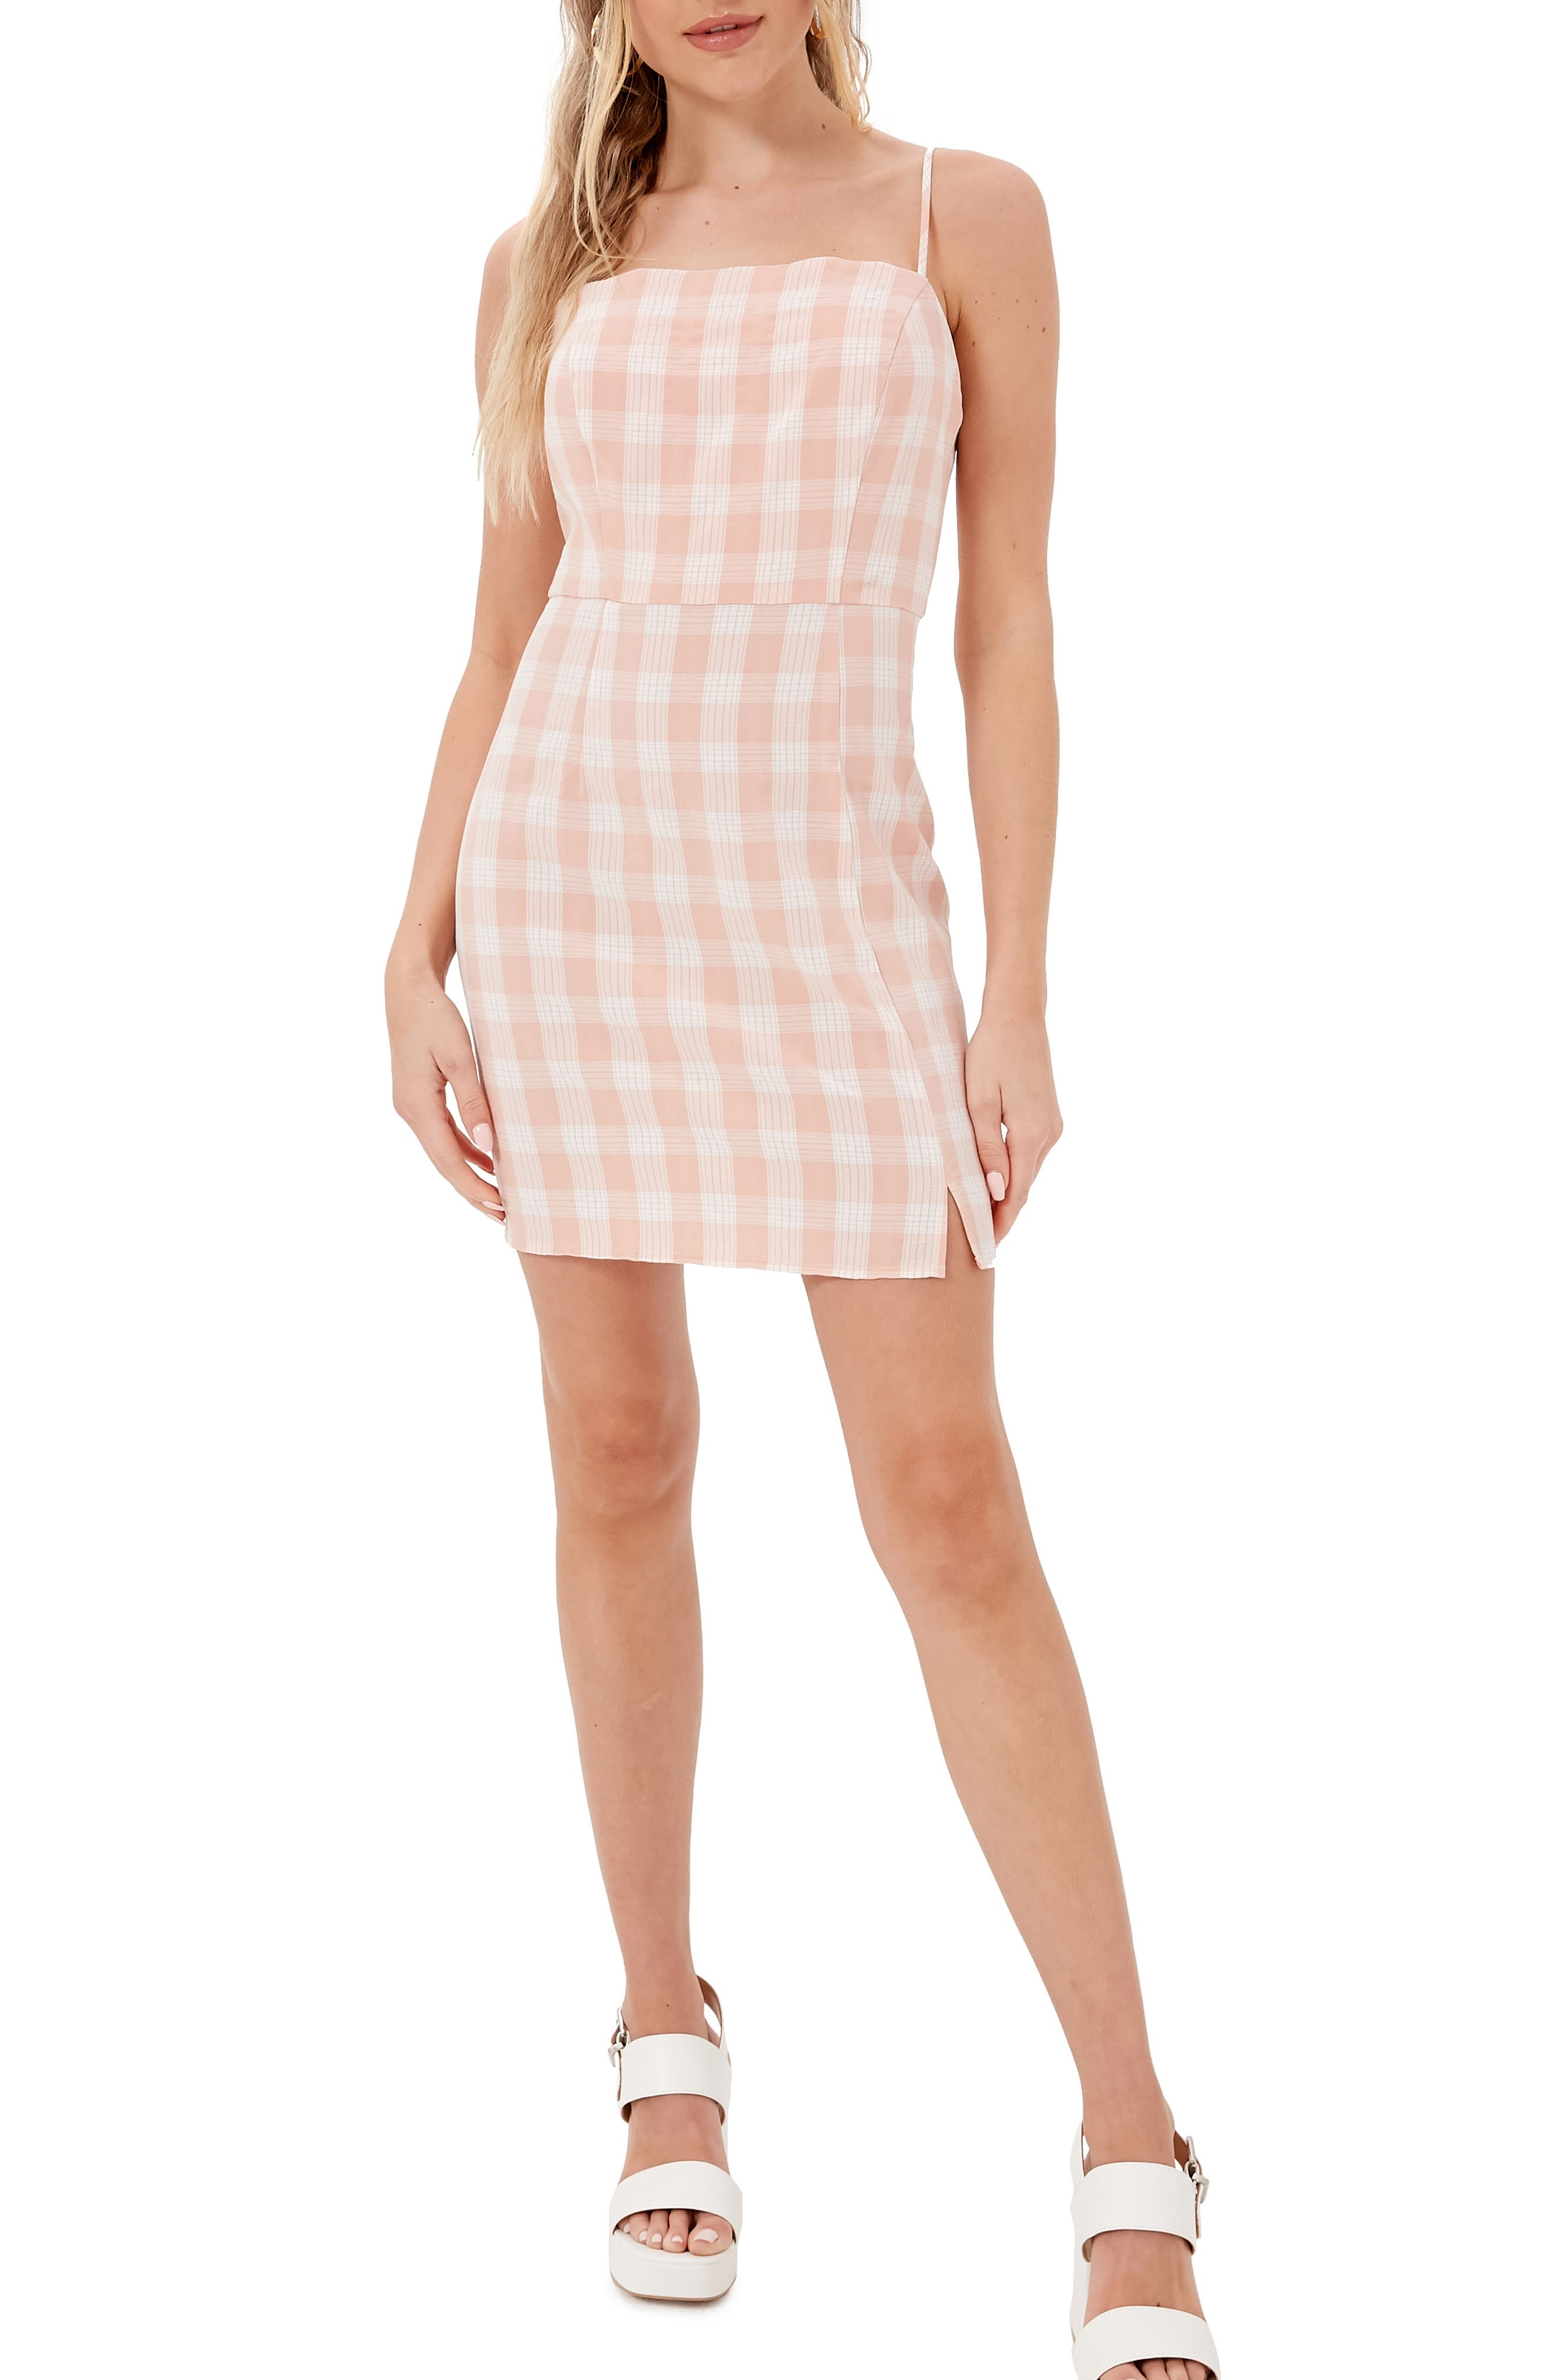 Gingham Square Neck Sleeveless Minidress